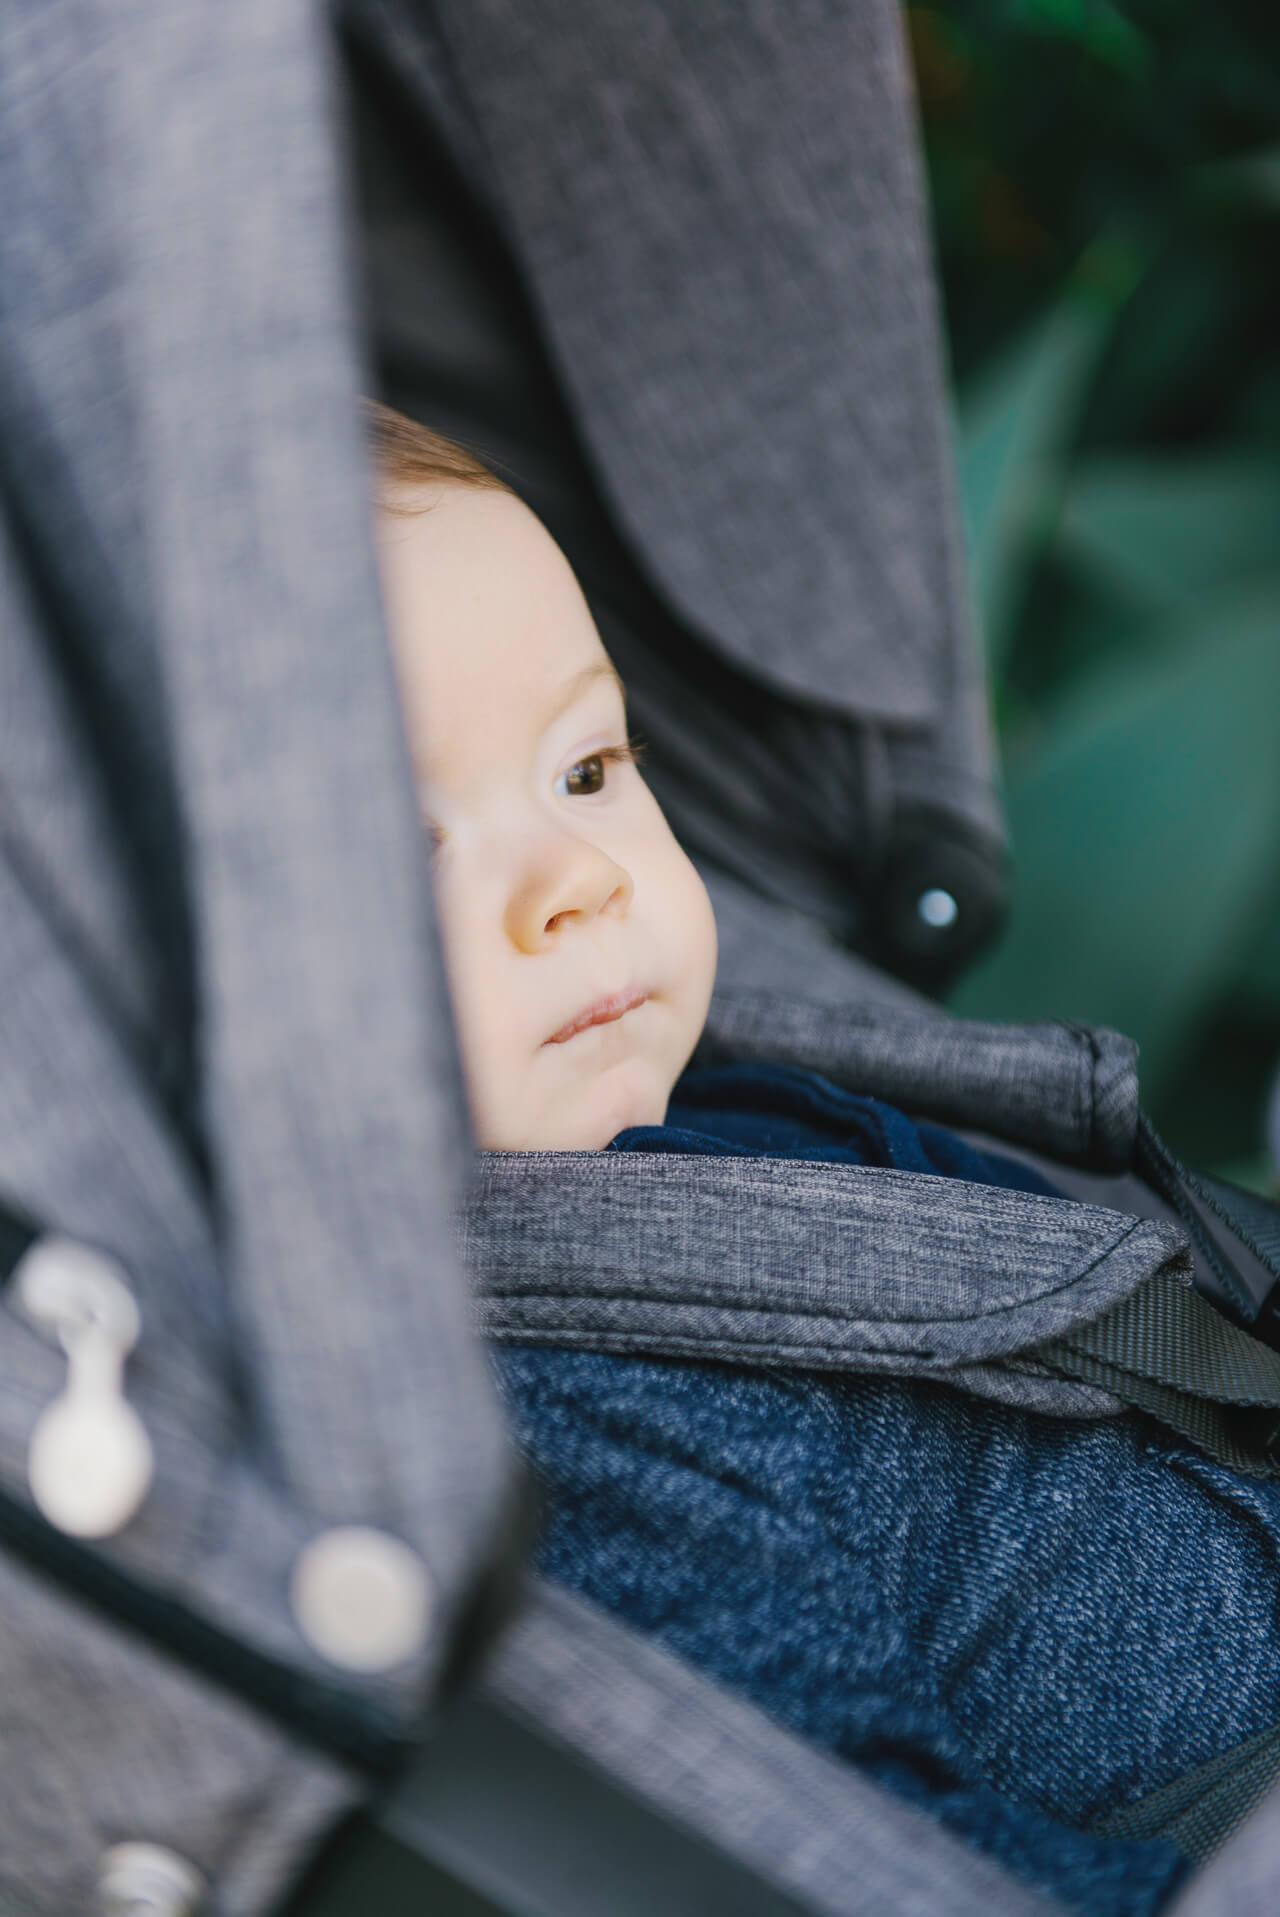 augustine in stroller